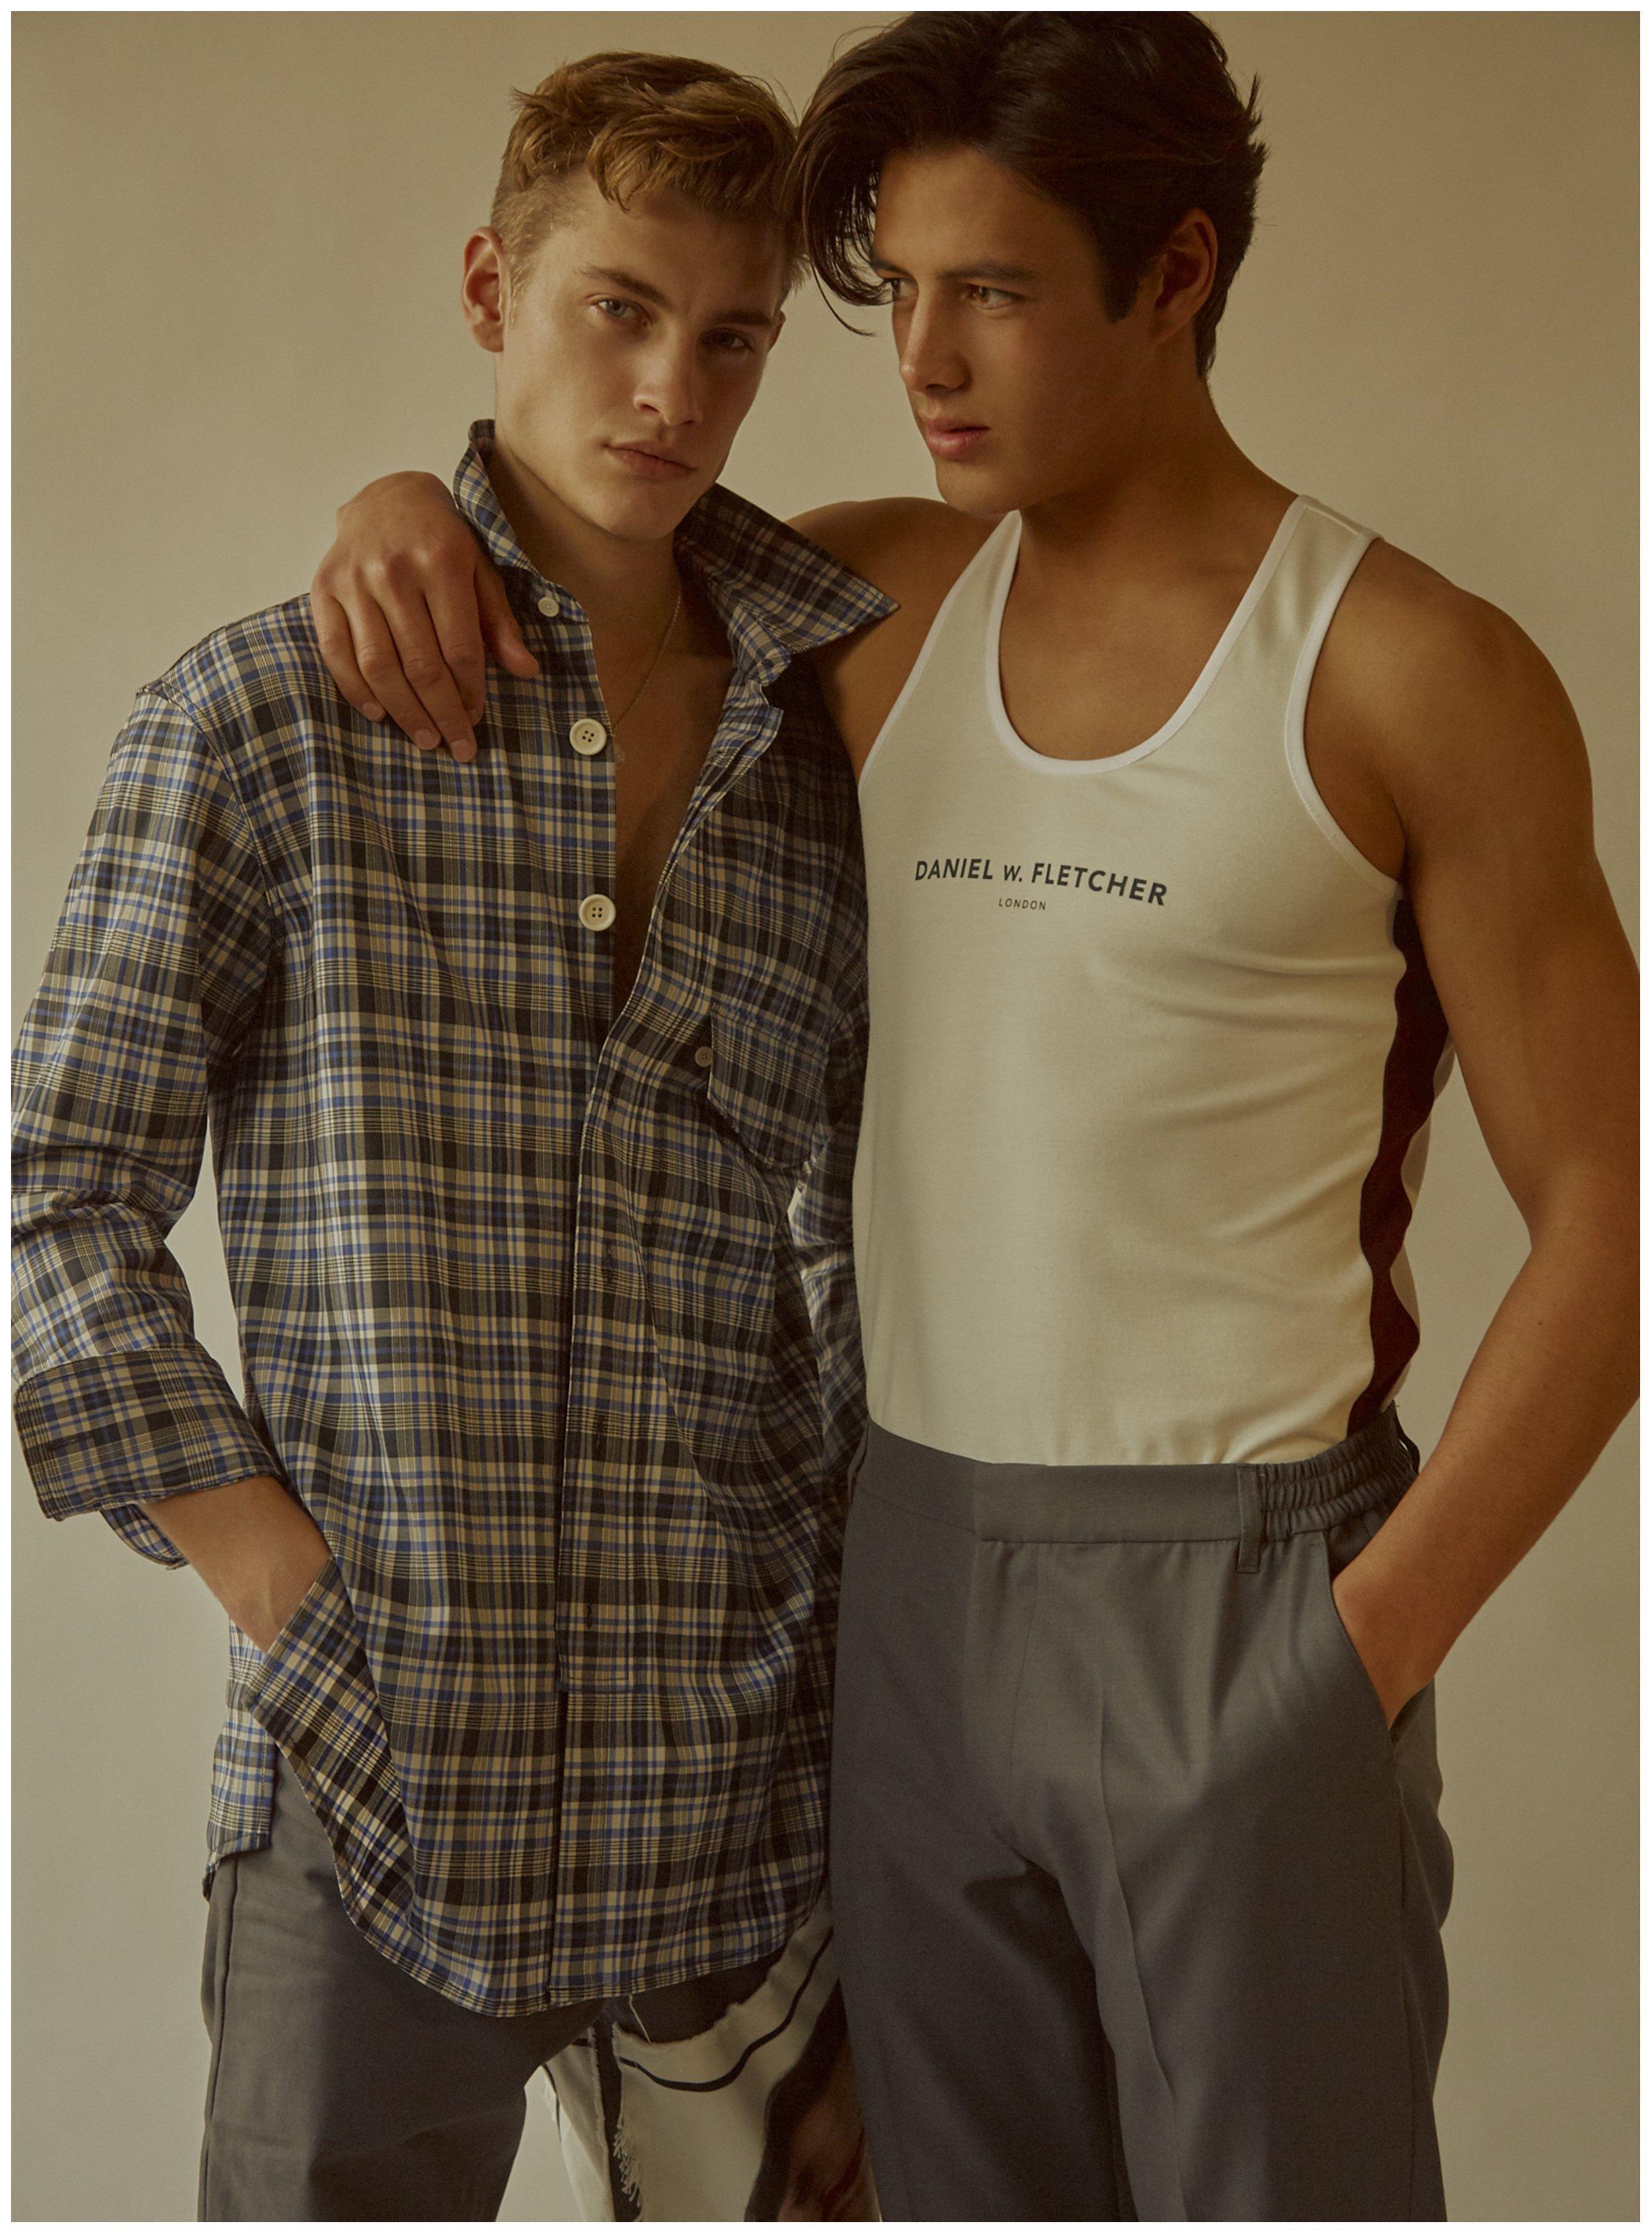 GayTimesGeorgeNaylor 02.jpg